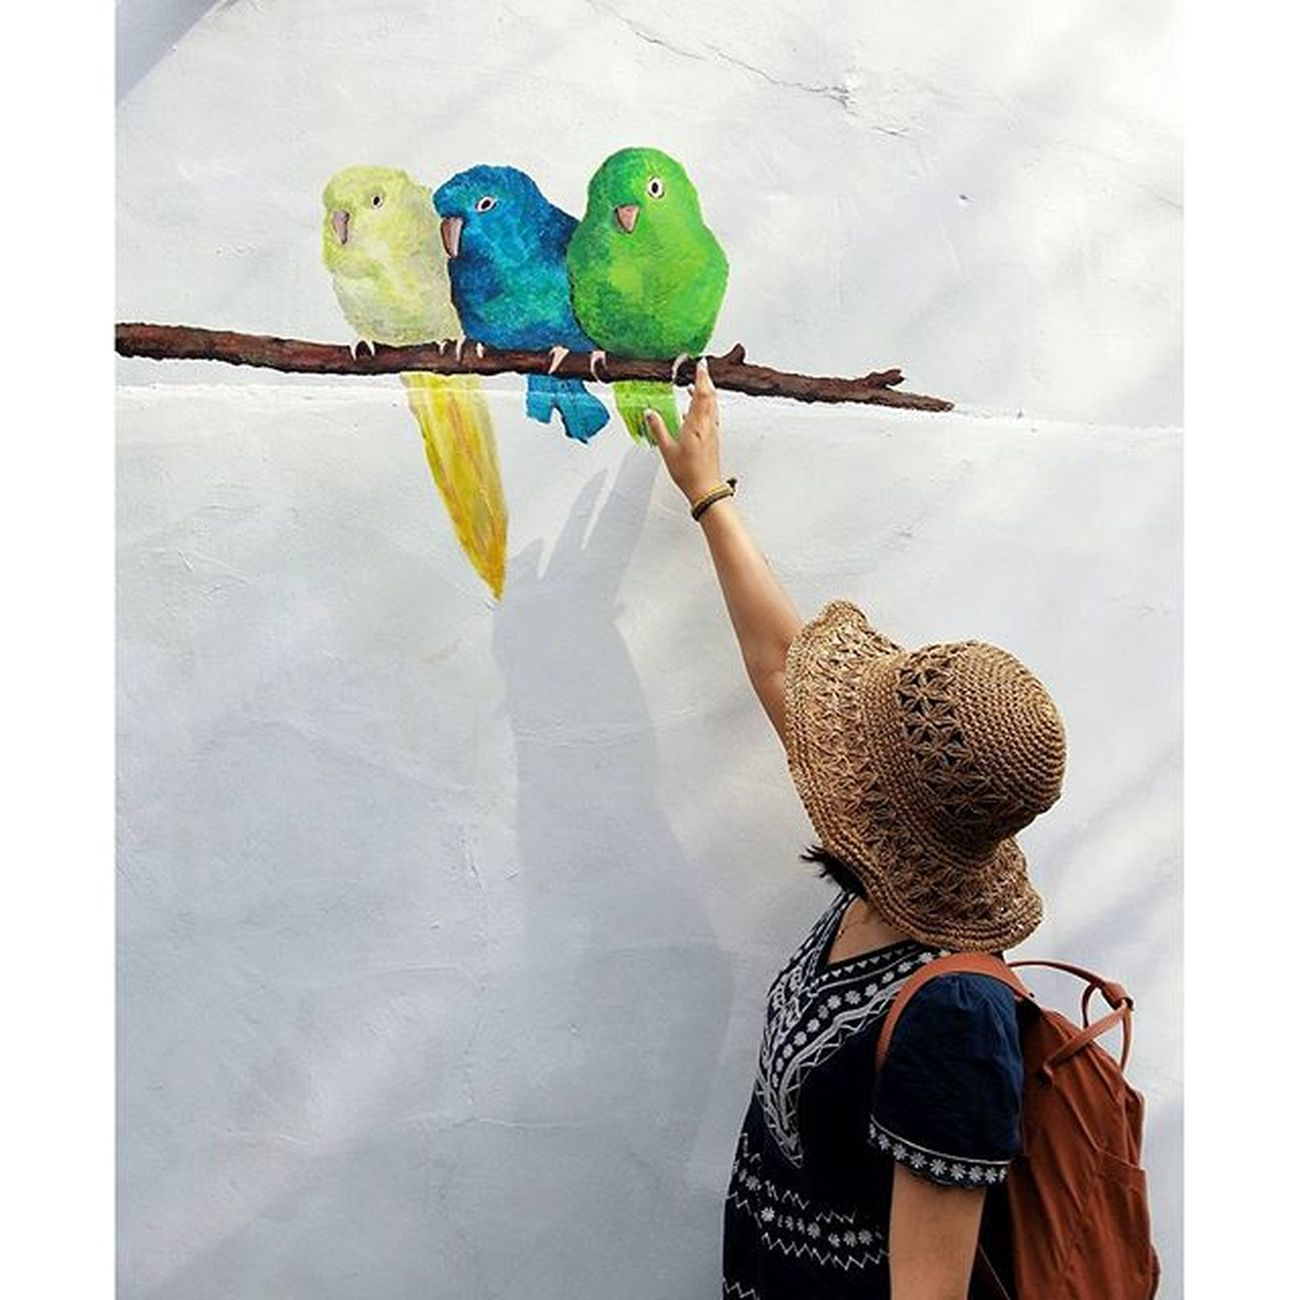 Bepartofstreetart Seoul Reaching to the blue bird 😉 모두들 행복한 주말 되세요 😁 서울둘레길